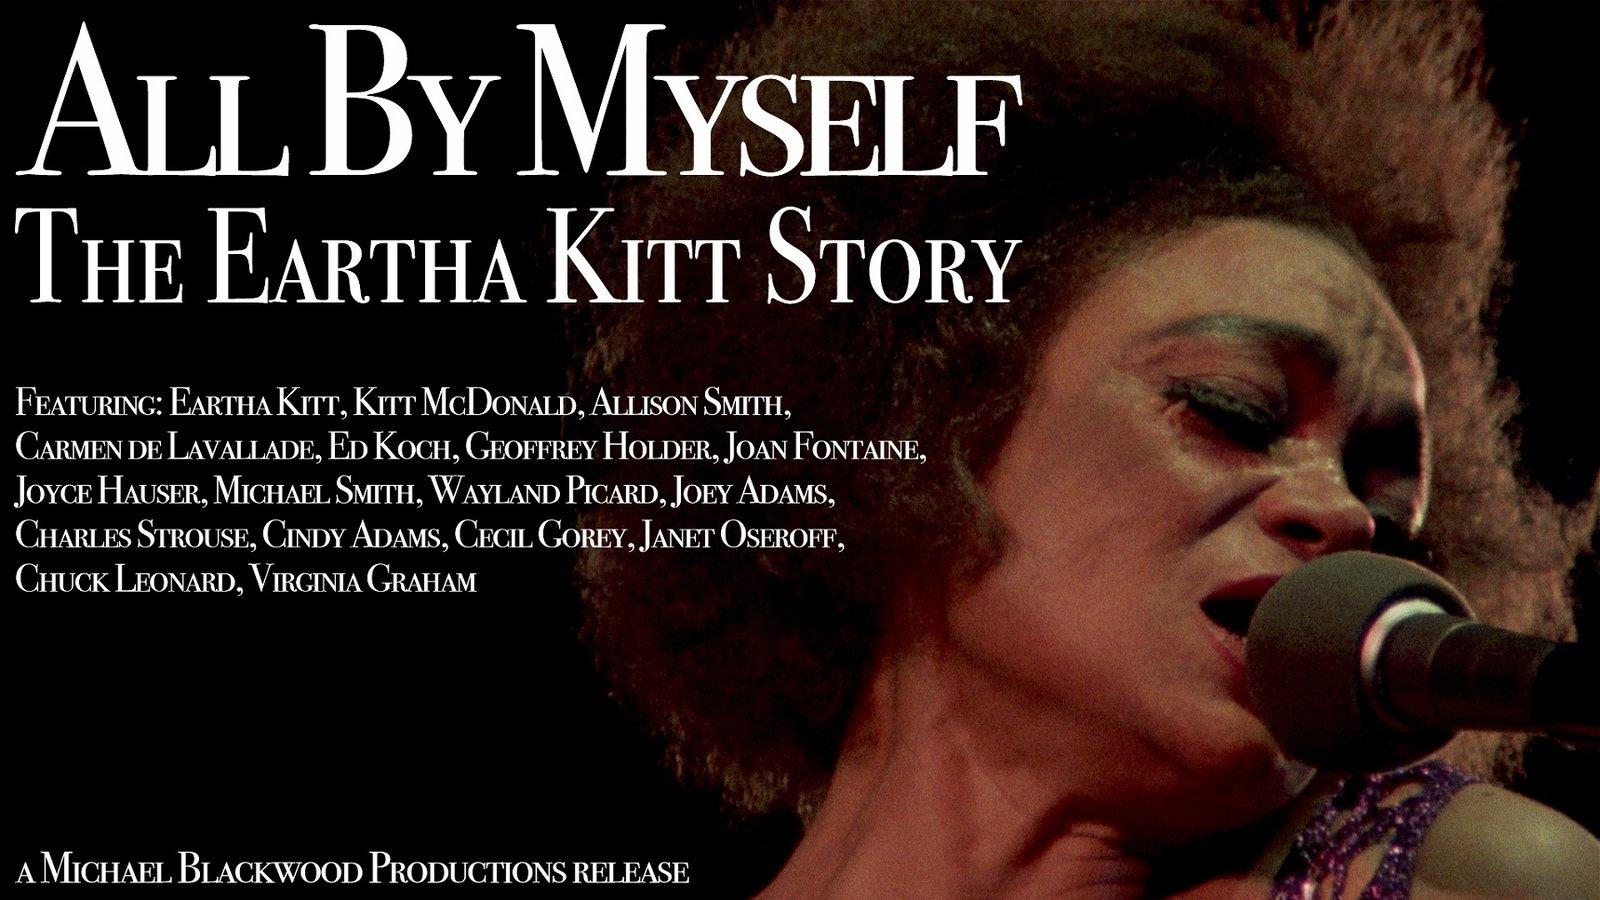 All by Myself - The Eartha Kitt Story